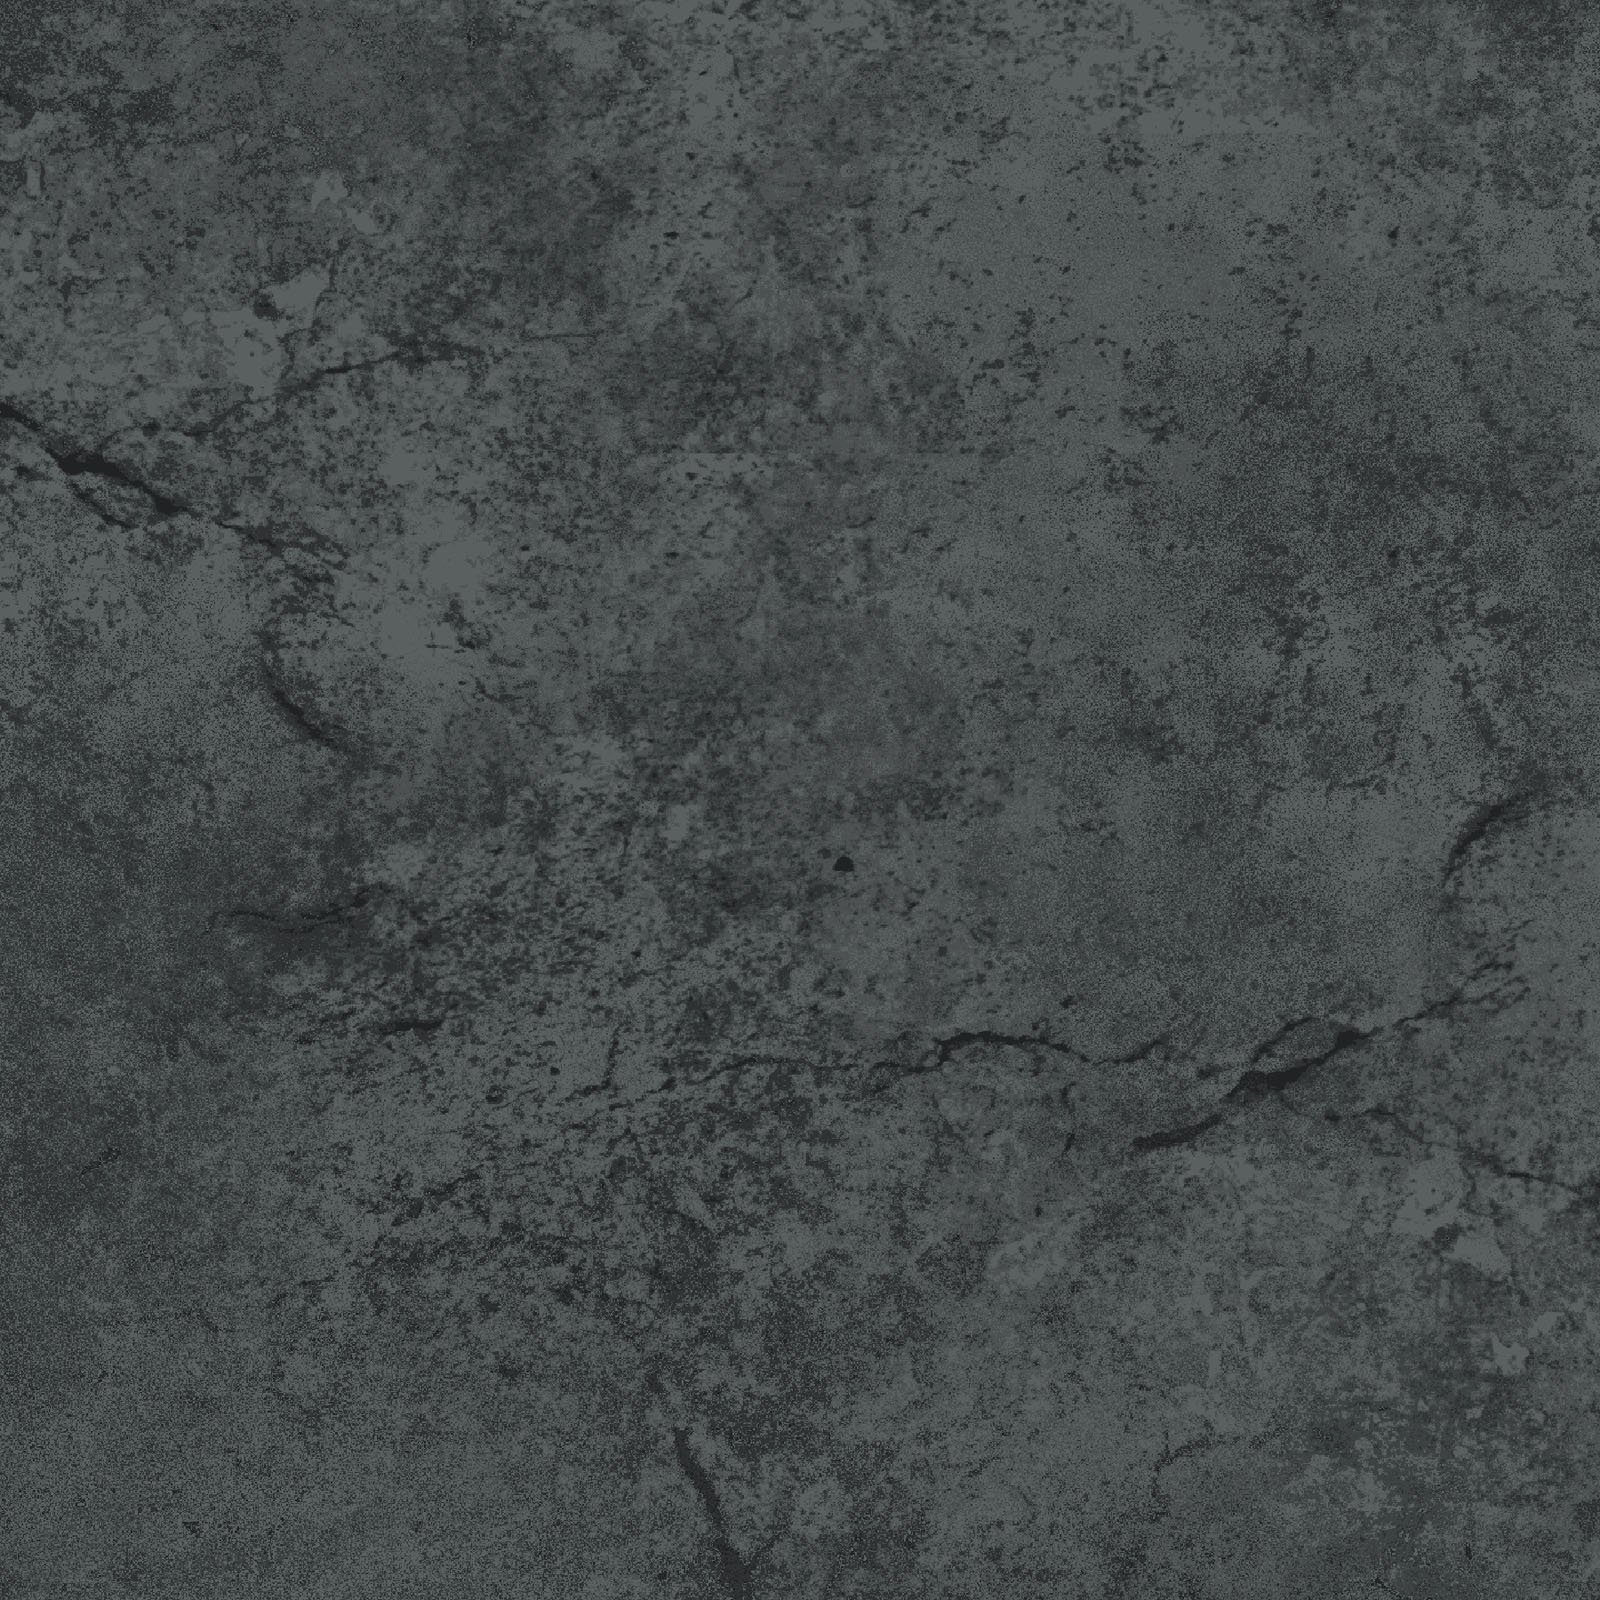 Marble - Dark Grey<br/>Maywood Studio 102-JK